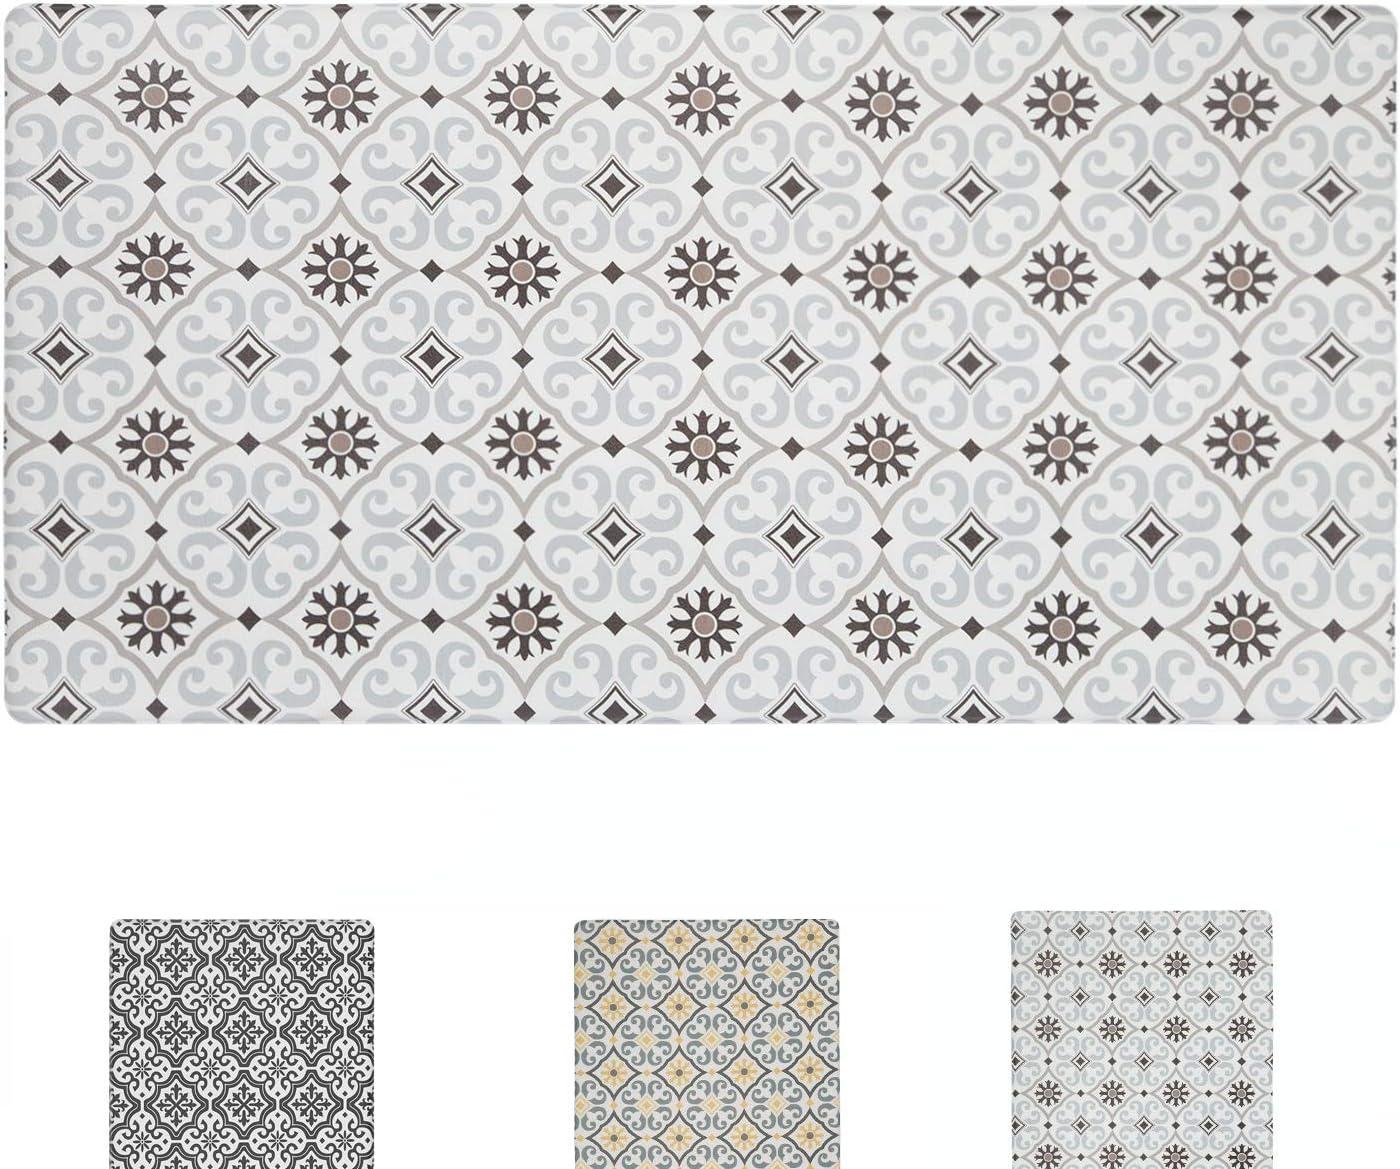 QSY Home Kitchen Anti Fatigue Floor Mats 20x39x1/2-Inch Comfort Standing Rugs for Laundry Bath Room Pvc Foam Bevel Edges Non-Slip Waterproof Mats, Grey/Brown